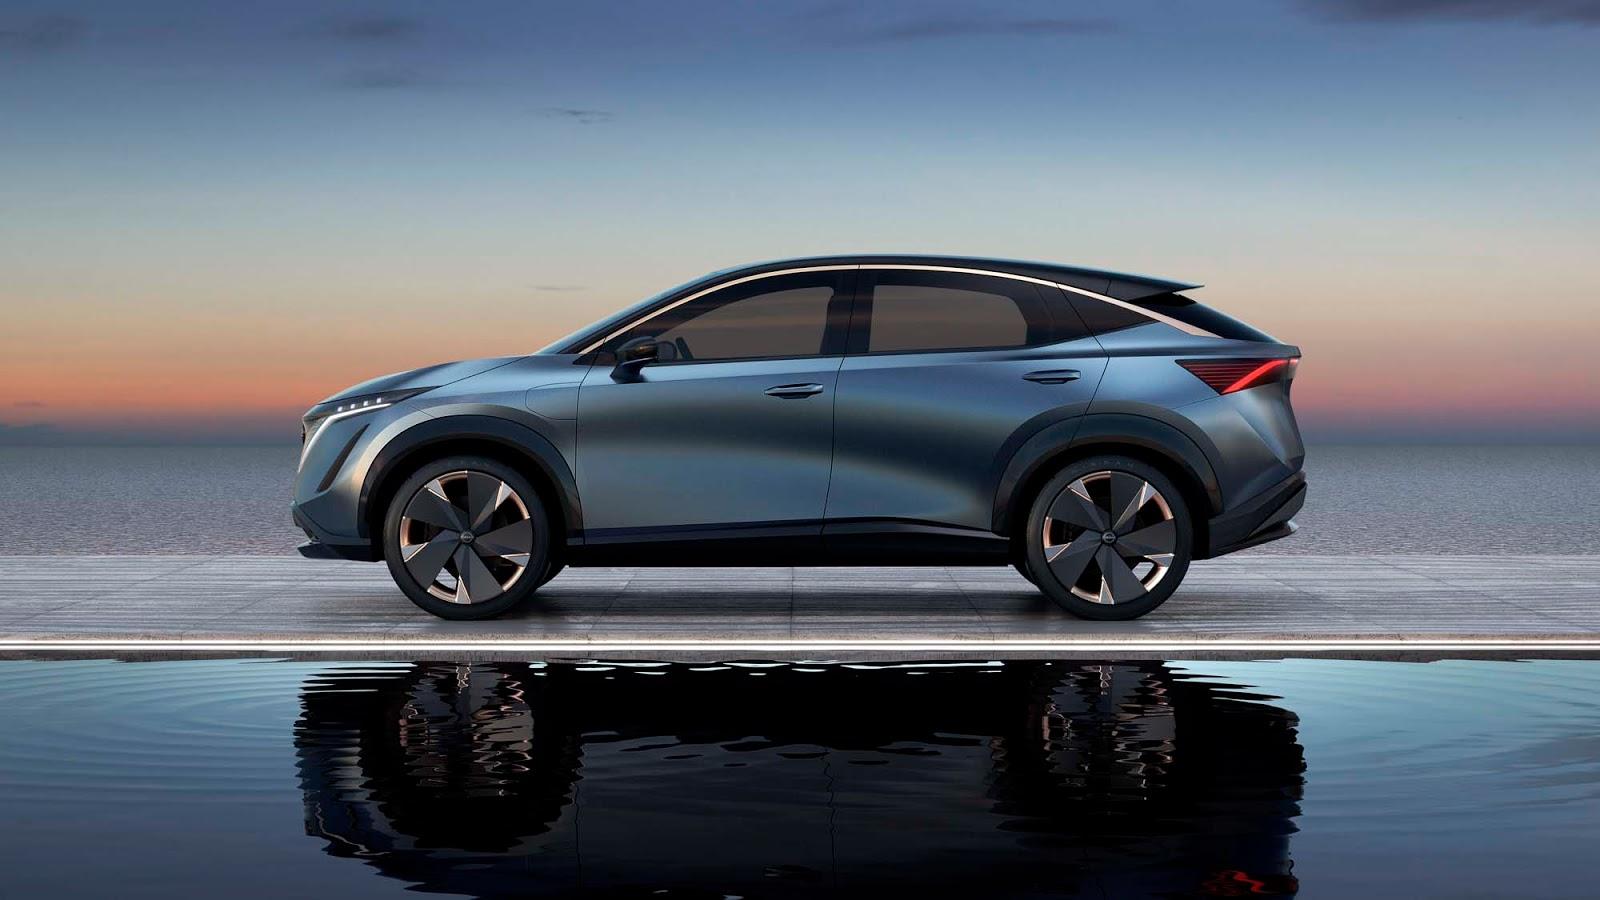 Nissan2BARIYA2BConcept 172B252812529 Με αυτό το μοντέλο η Nissan μας δείχνει το μέλλον της Electric cars, Nissan, Έκθεση, ιαπωνικά